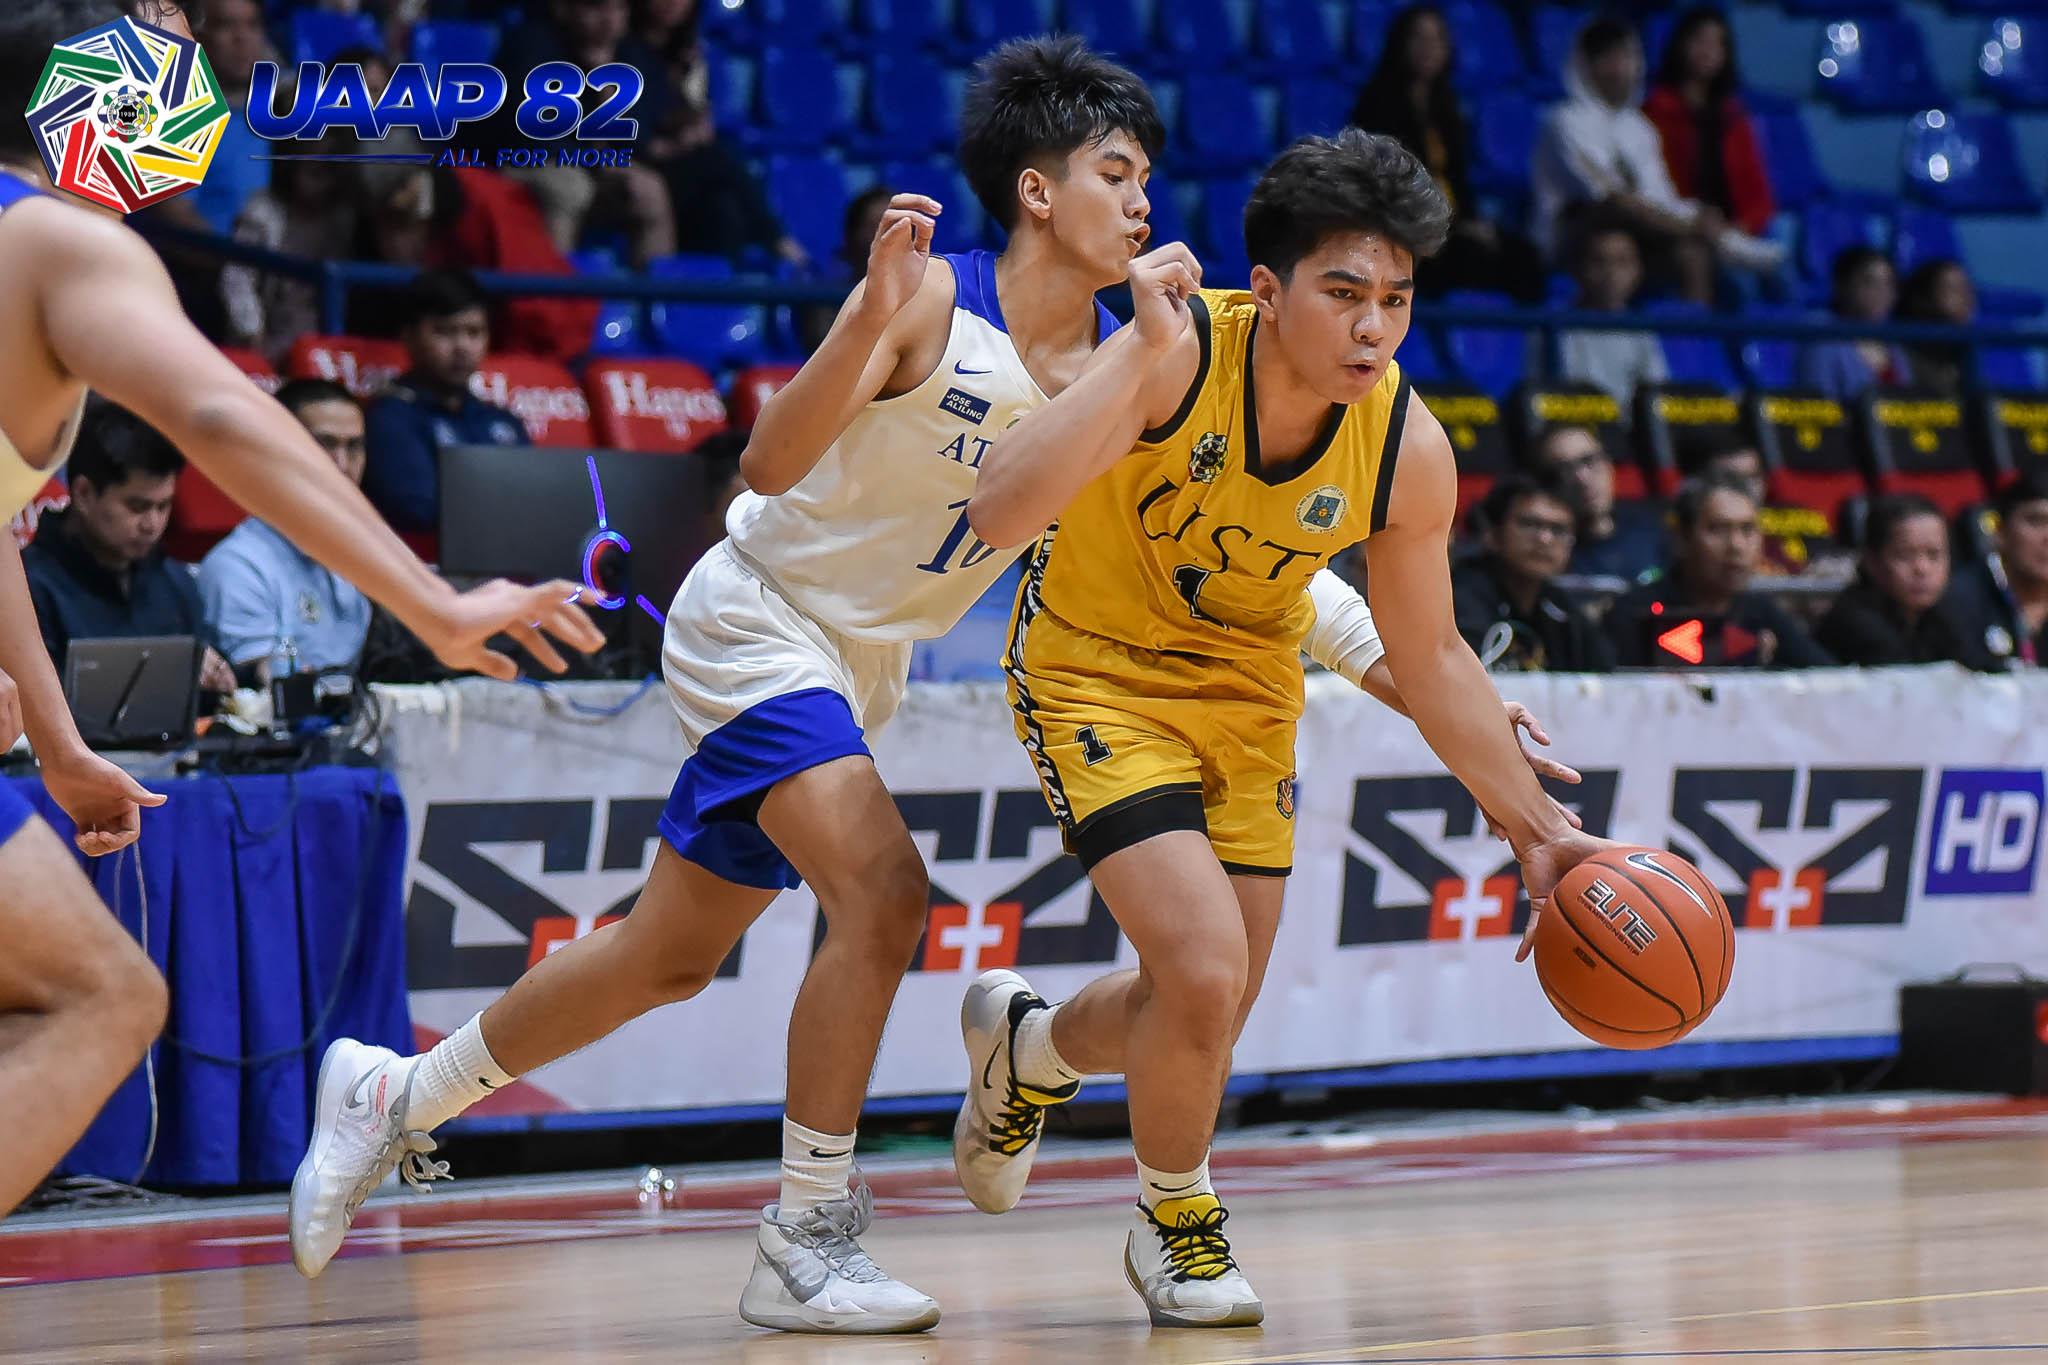 UAAP-82-Jrs-ADMU-vs.-UST-Cortez-6851 Fortea, Figueroa, Estacio lead crack UAAP HS class of '21 ADMU Basketball FEU News NU UAAP UP UST  - philippine sports news